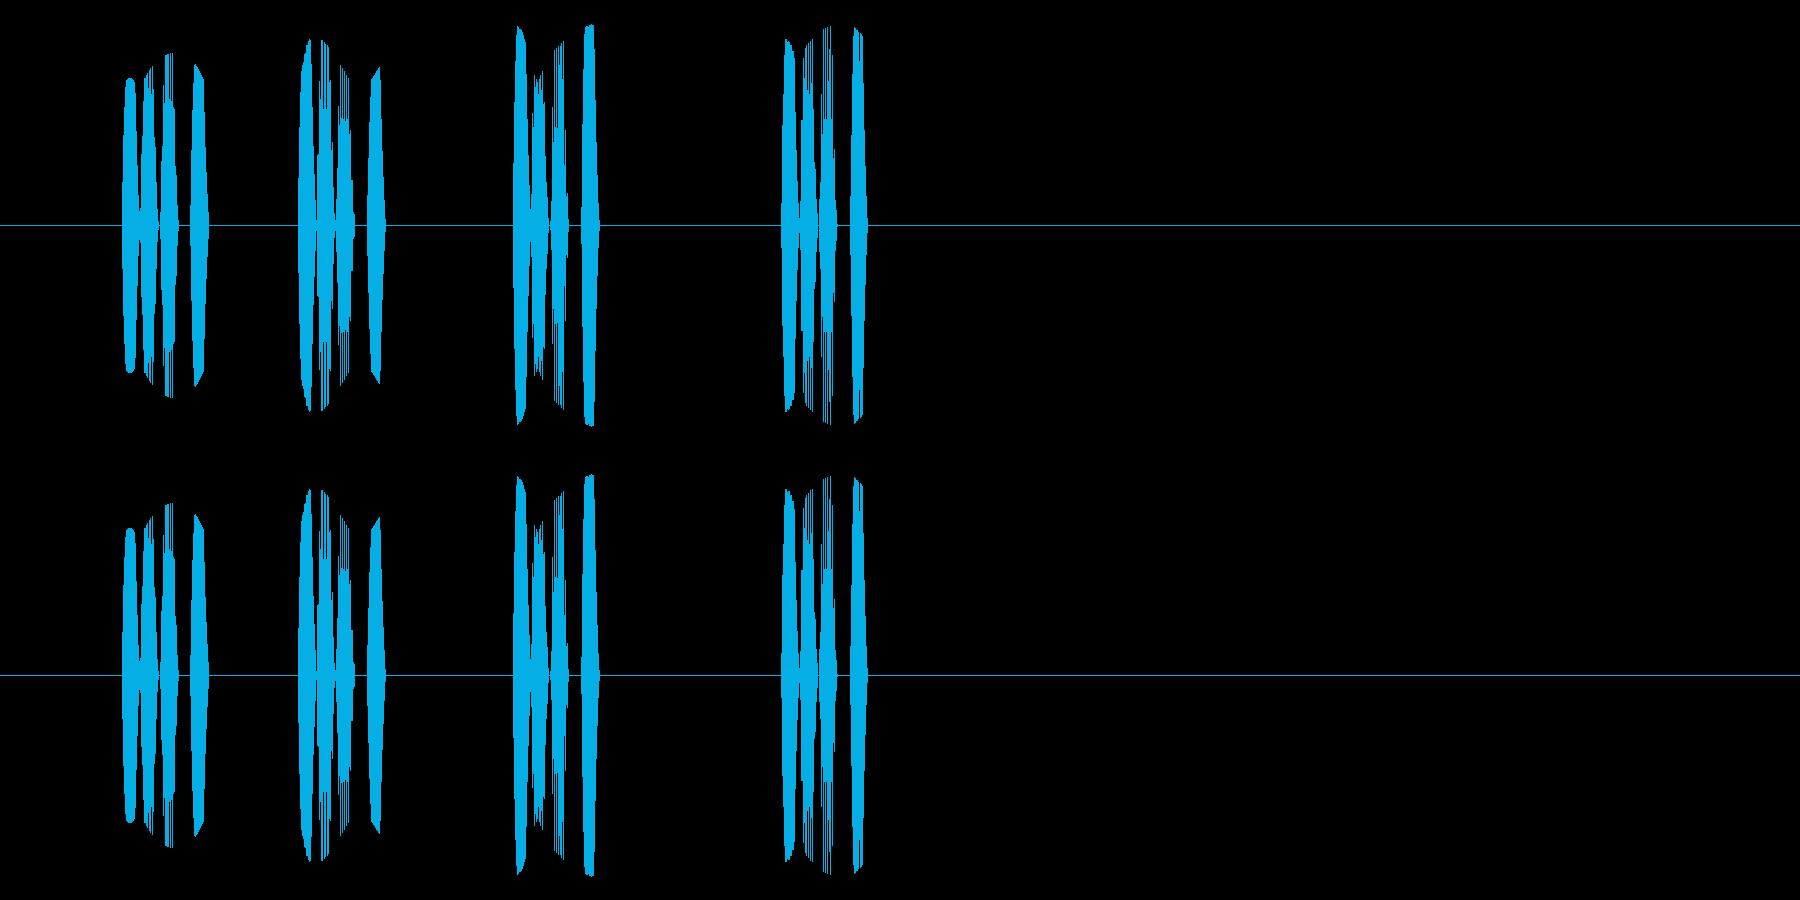 SNES-RPG04-17(魔法 状態)の再生済みの波形